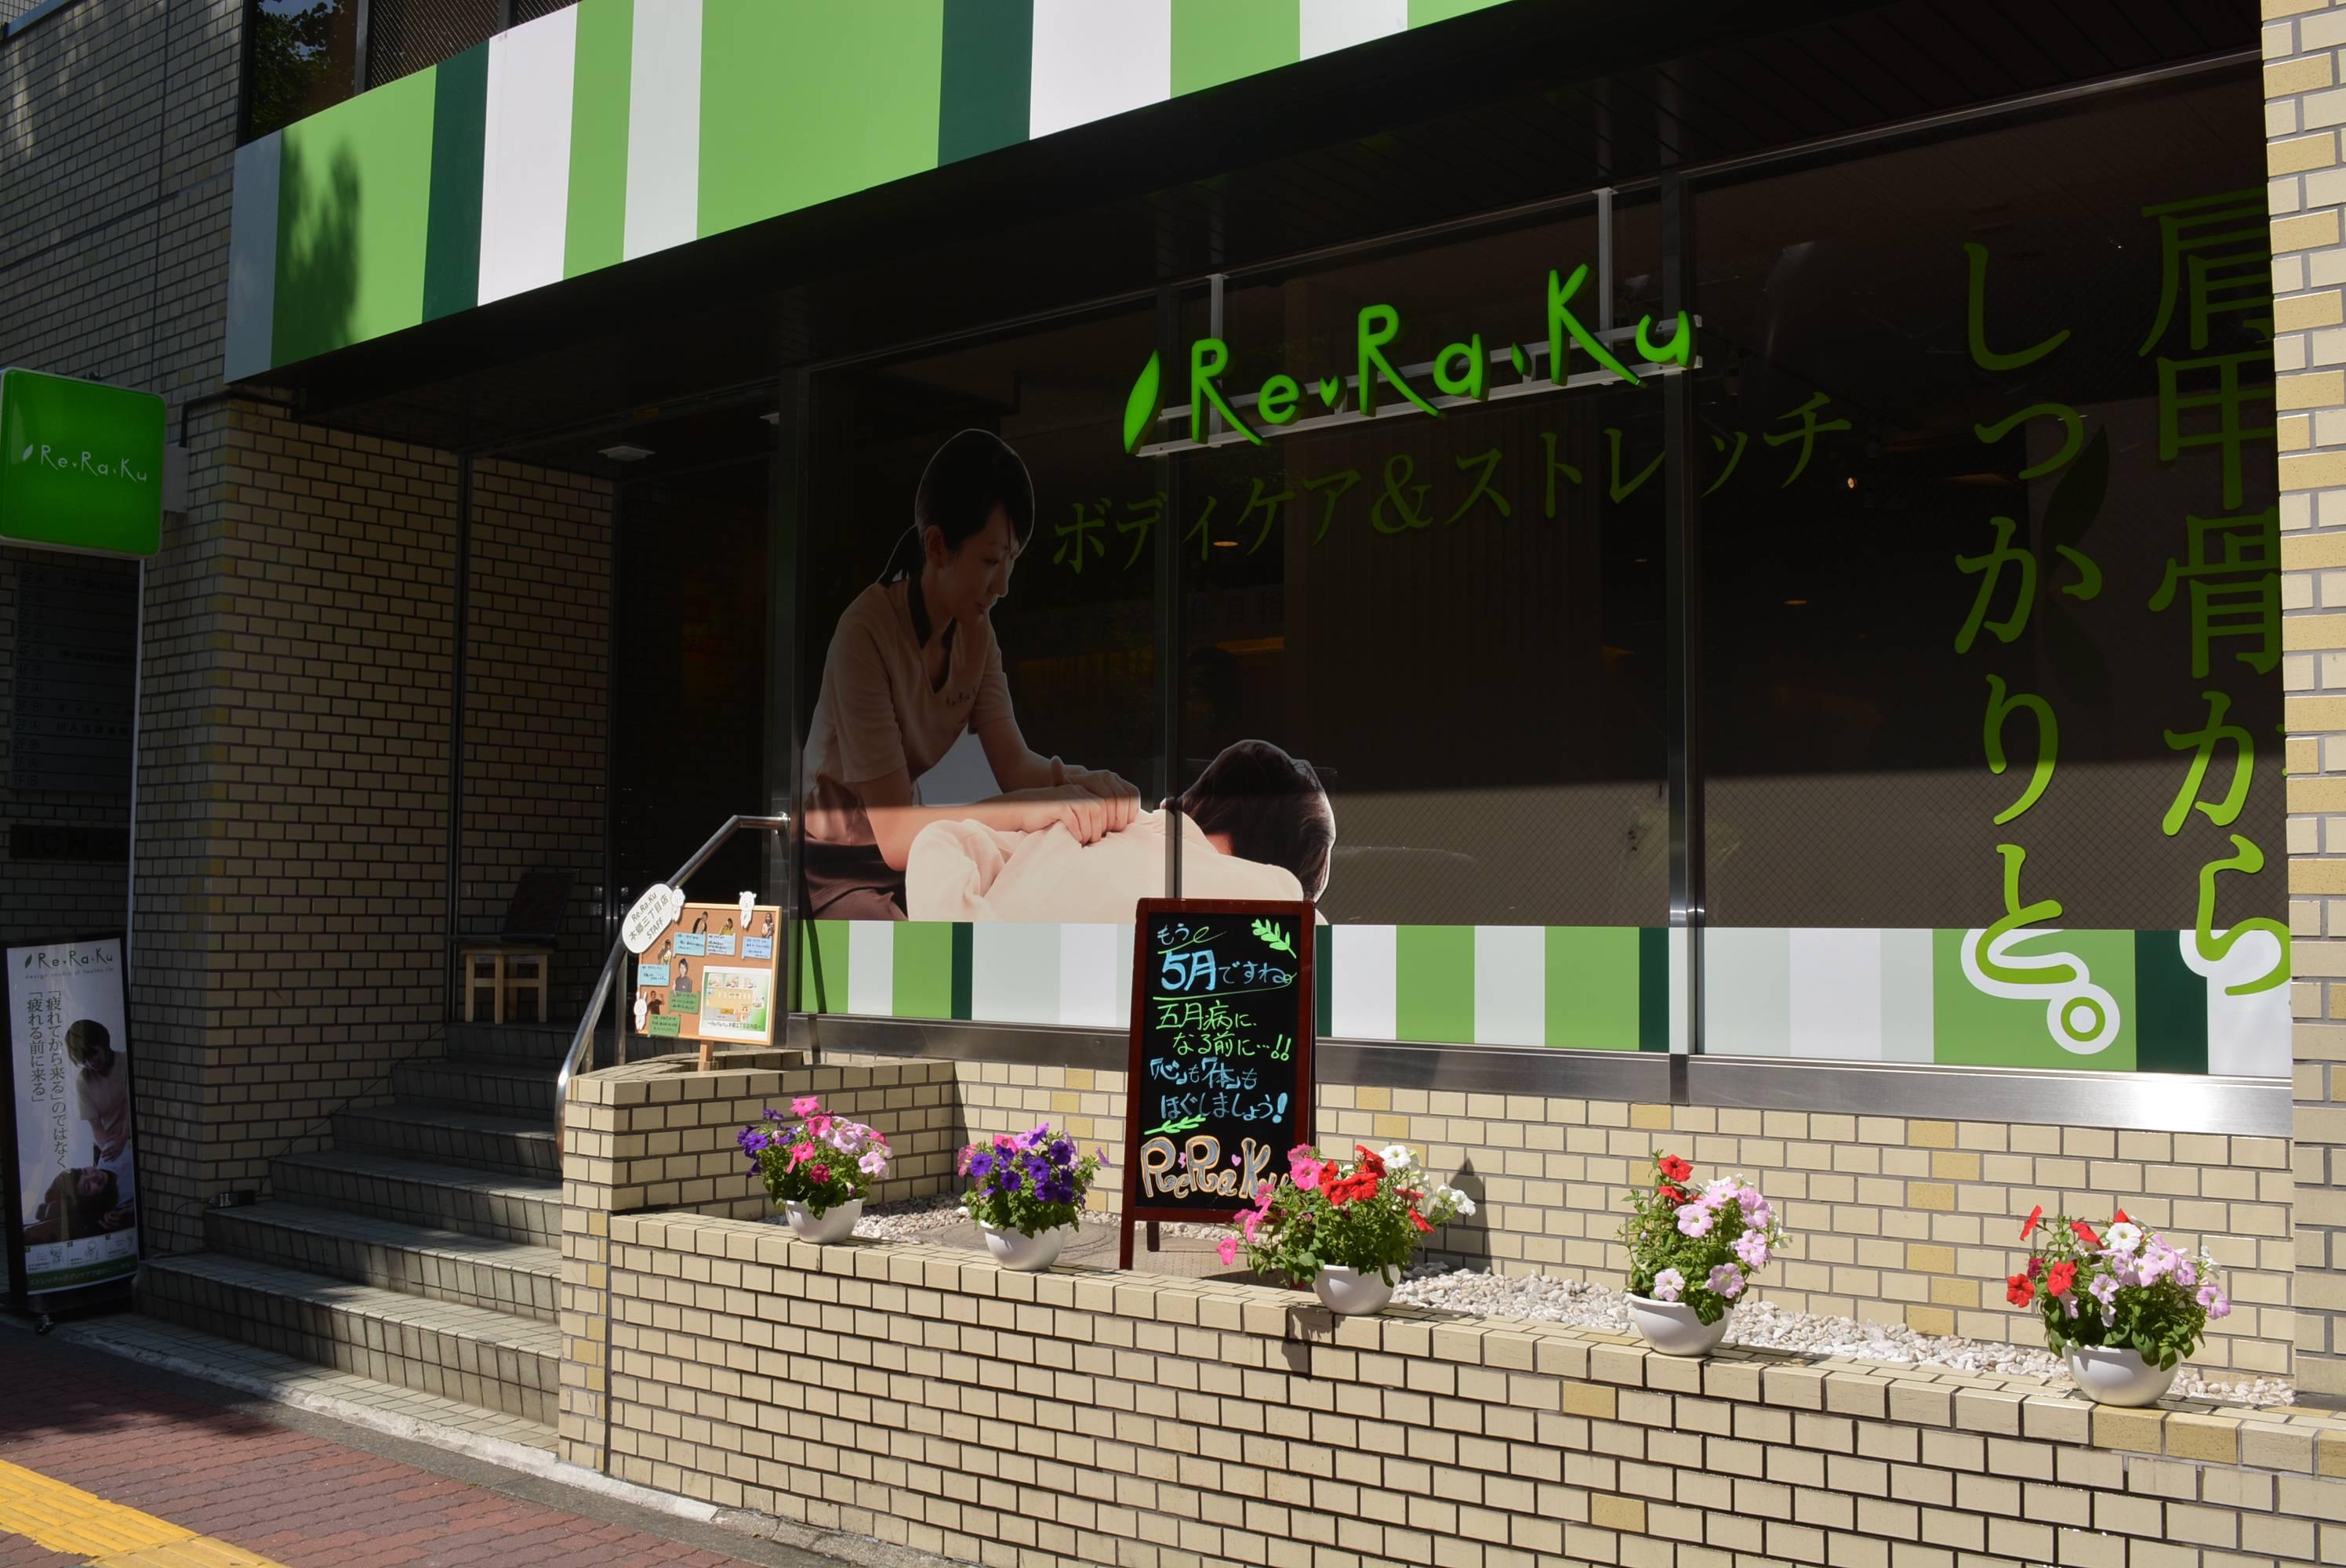 Re.Ra.Ku 本郷三丁目店